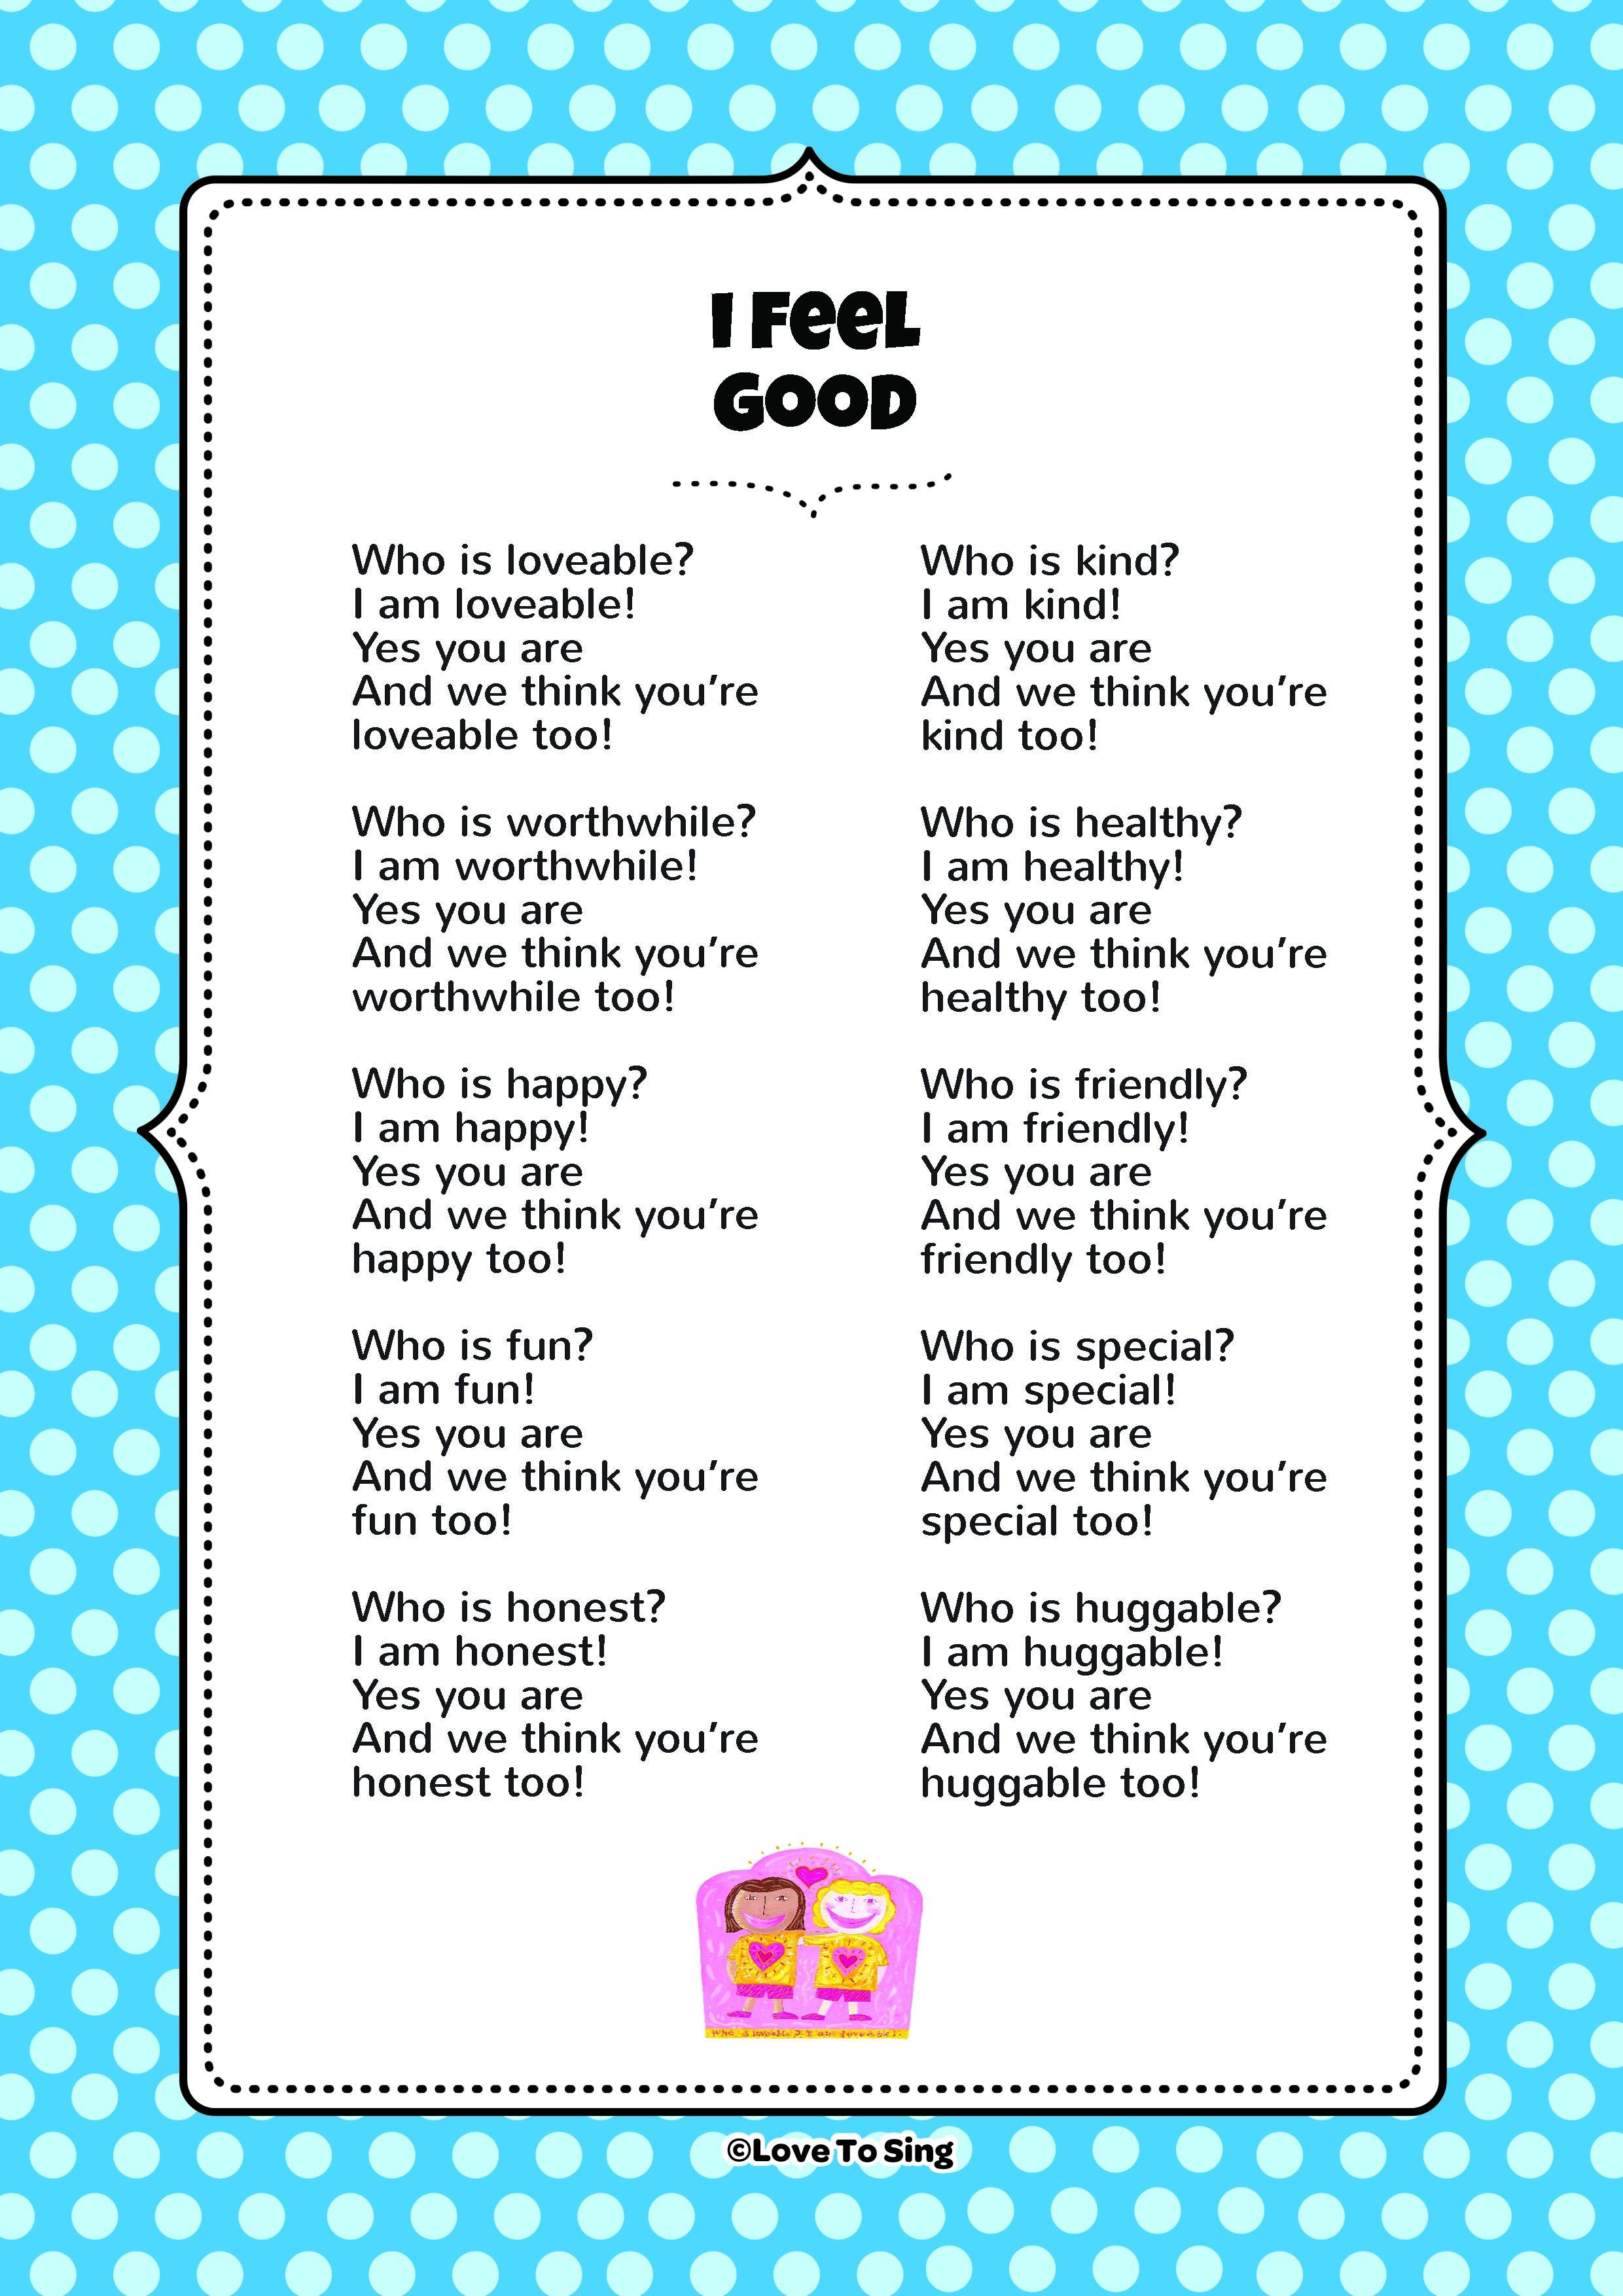 I Feel Good | Kids Video Song with FREE Lyrics & Activities!